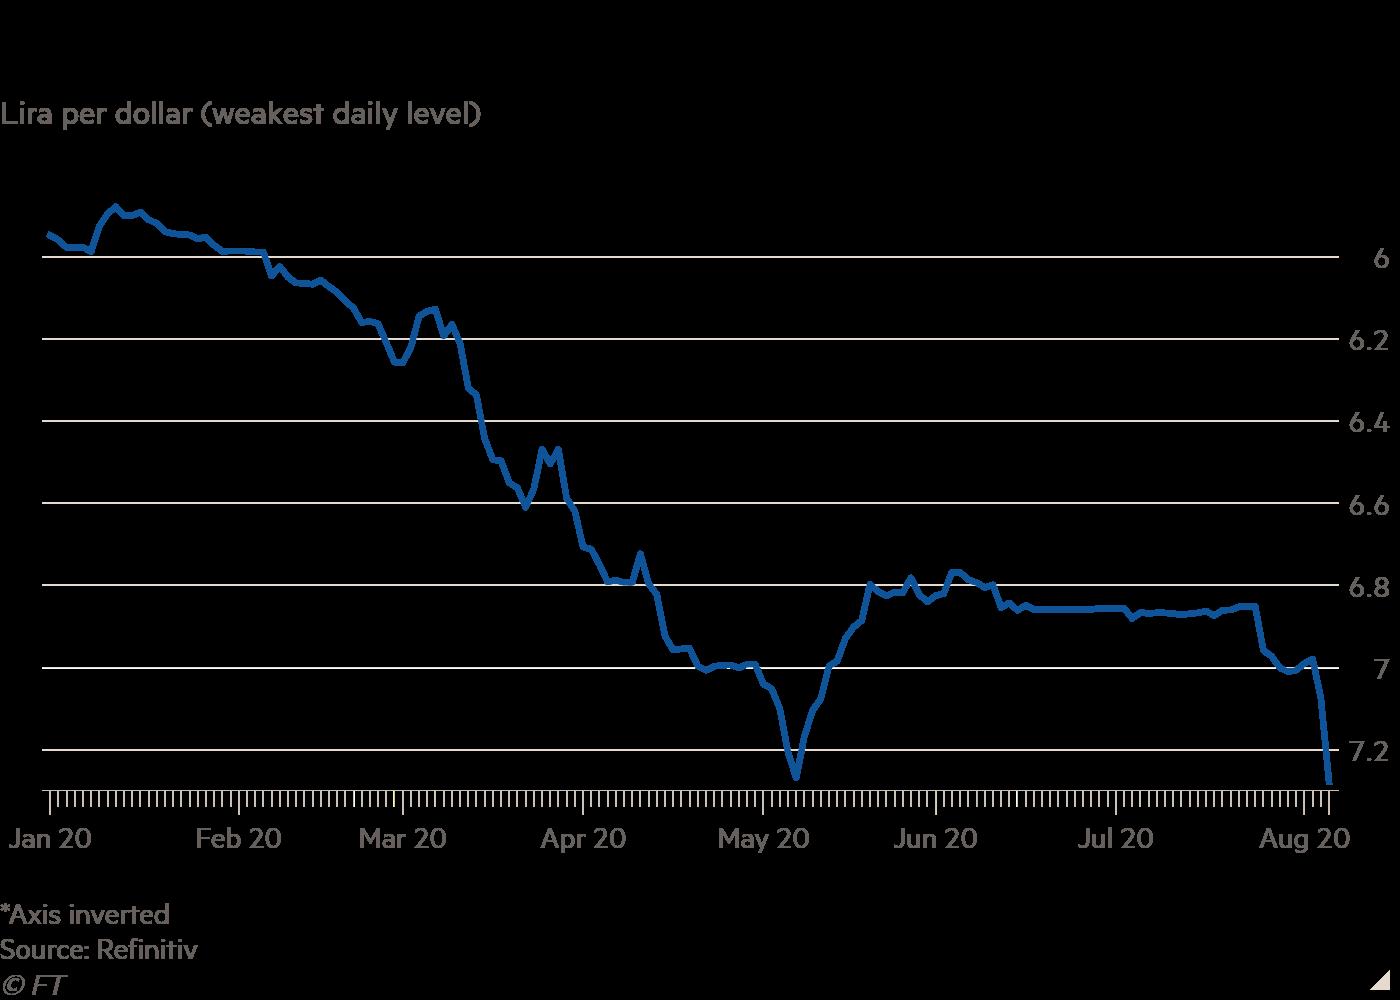 Как менялся курс лиры к доллару